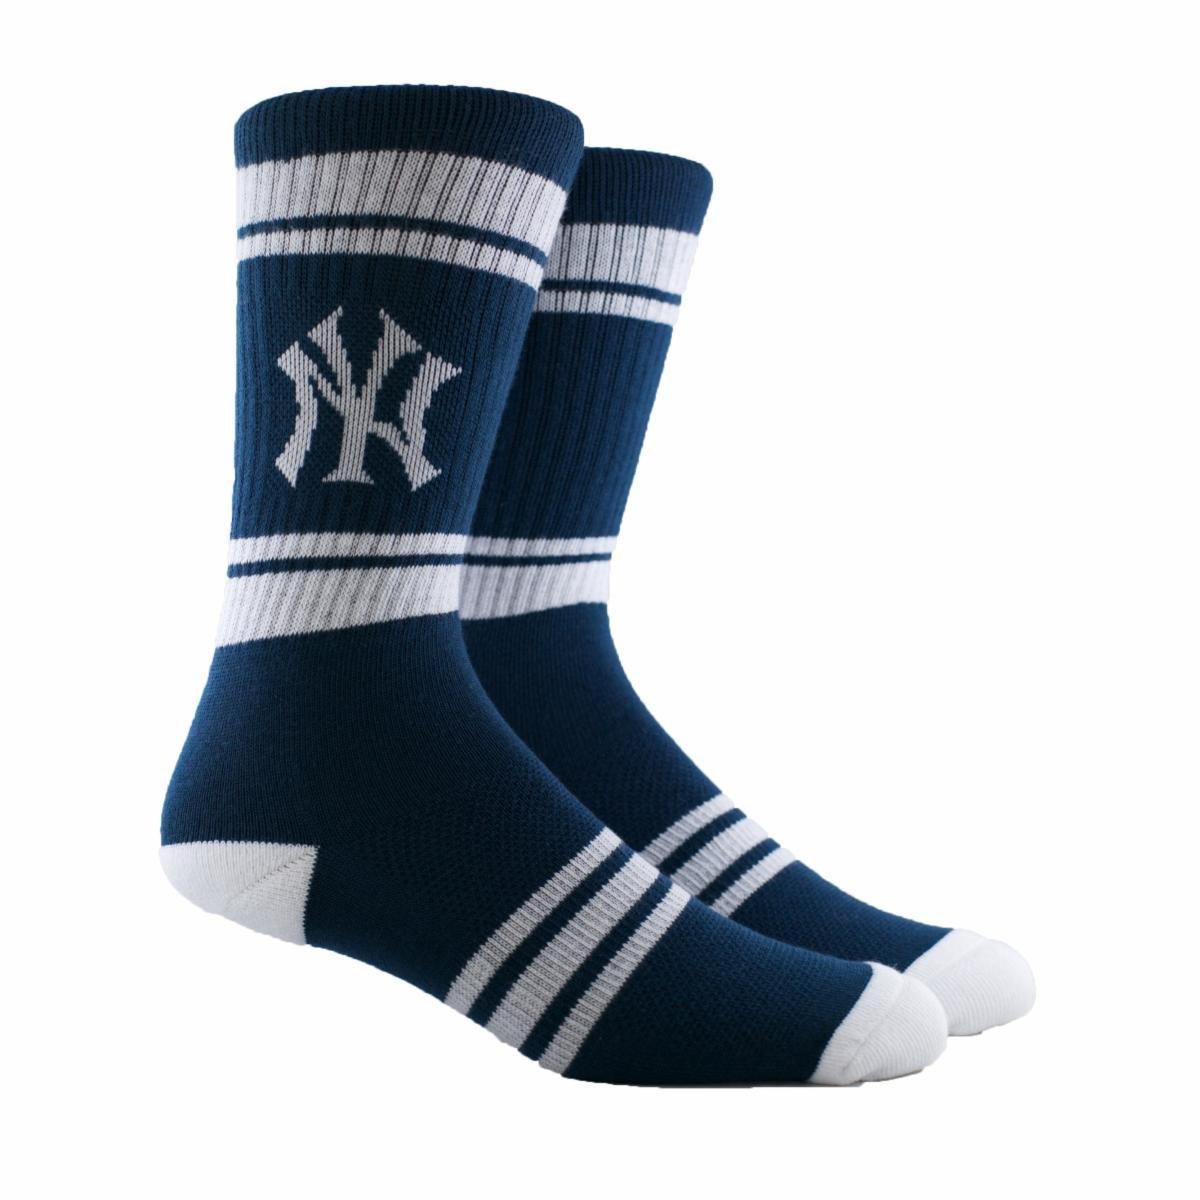 PKWY MLB Stripe Crew Socks by Stance Boston) Mookie Betts